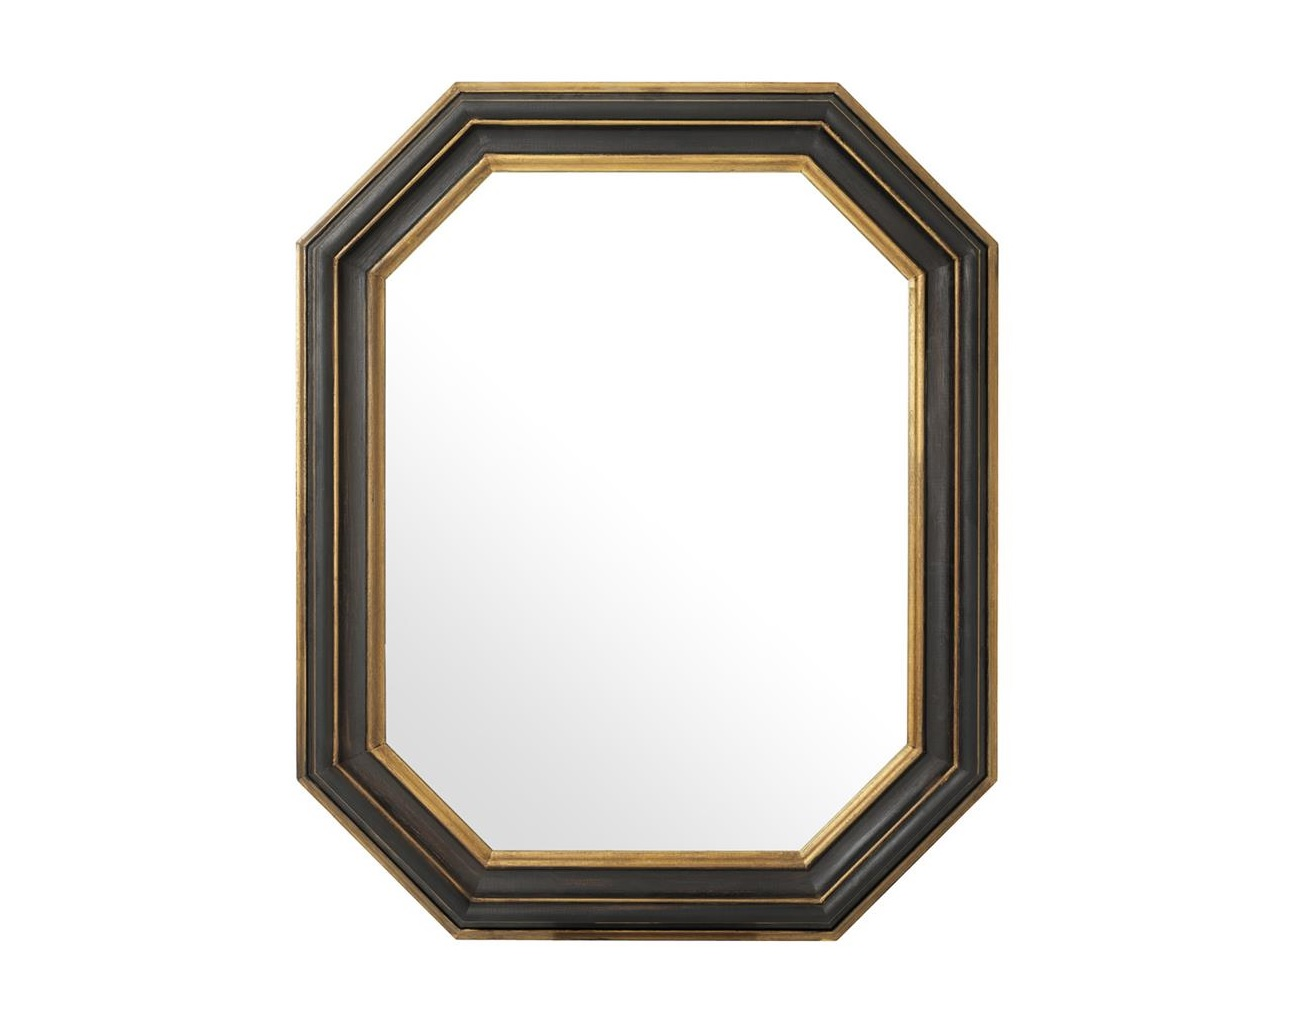 Зеркало Mirror UxbridgeНастенные зеркала<br><br><br>Material: Дерево<br>Ширина см: 120<br>Высота см: 146